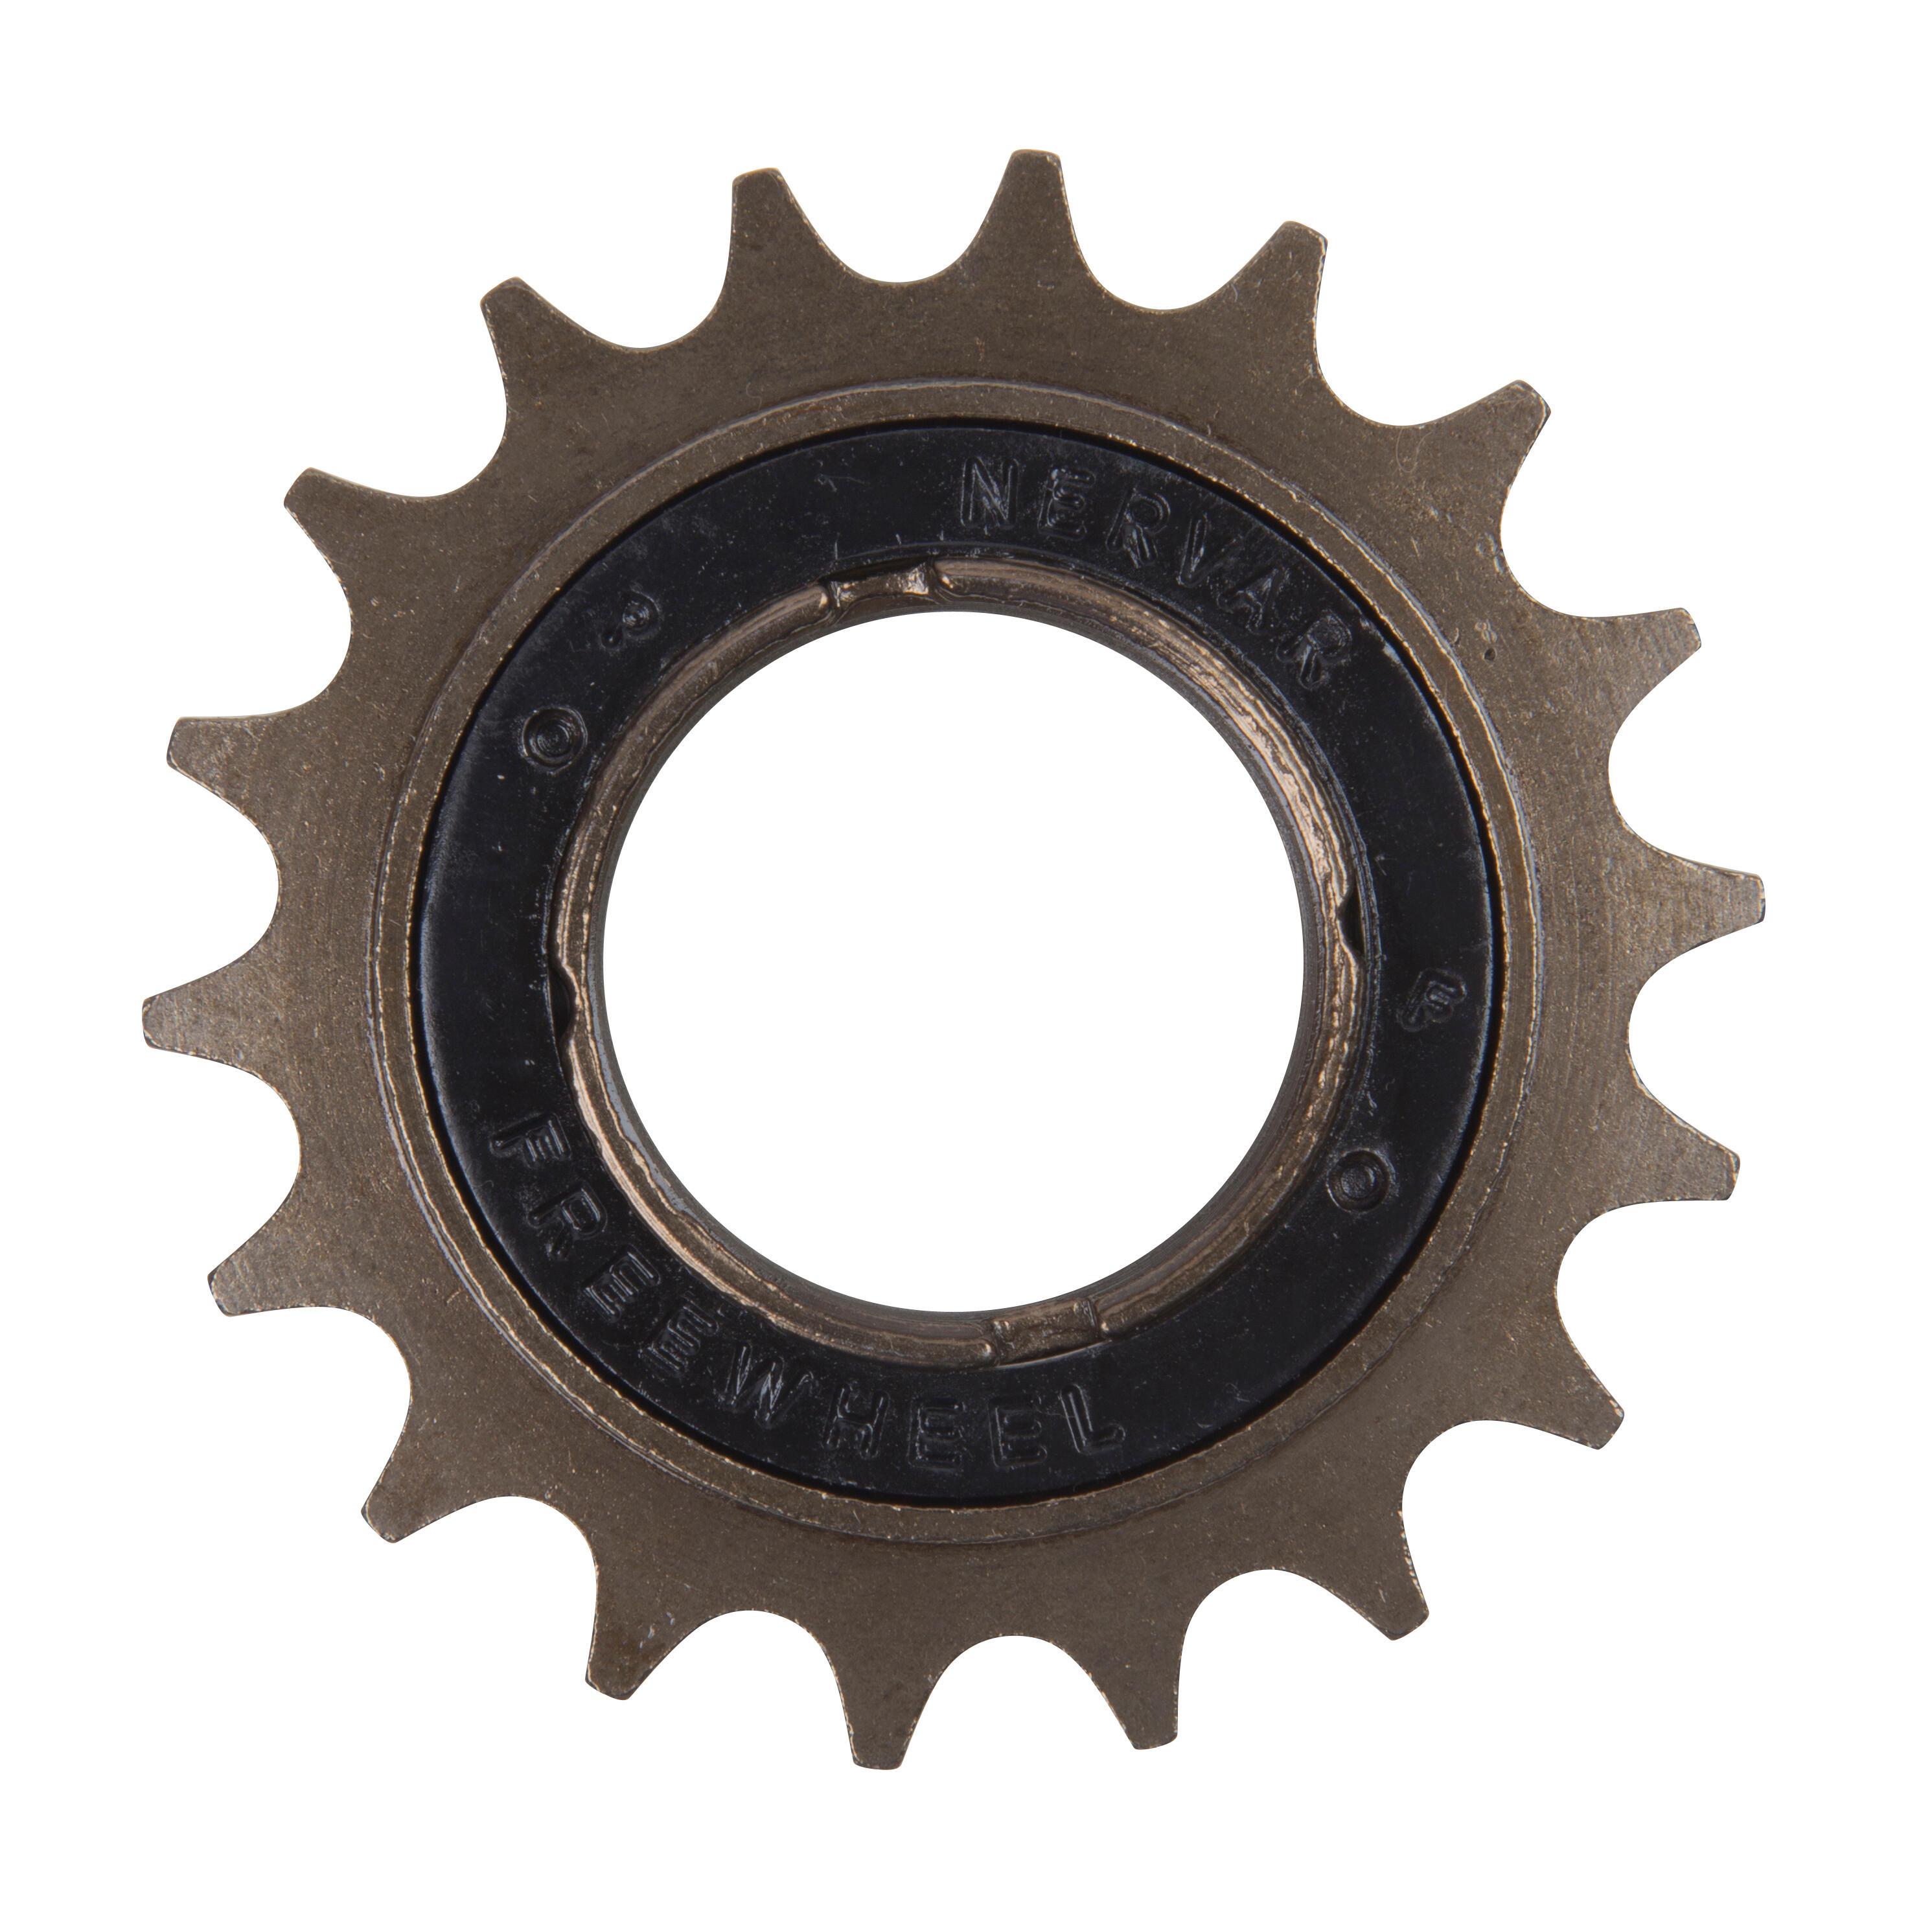 B'twin Schroef freewheel 1 versnelling